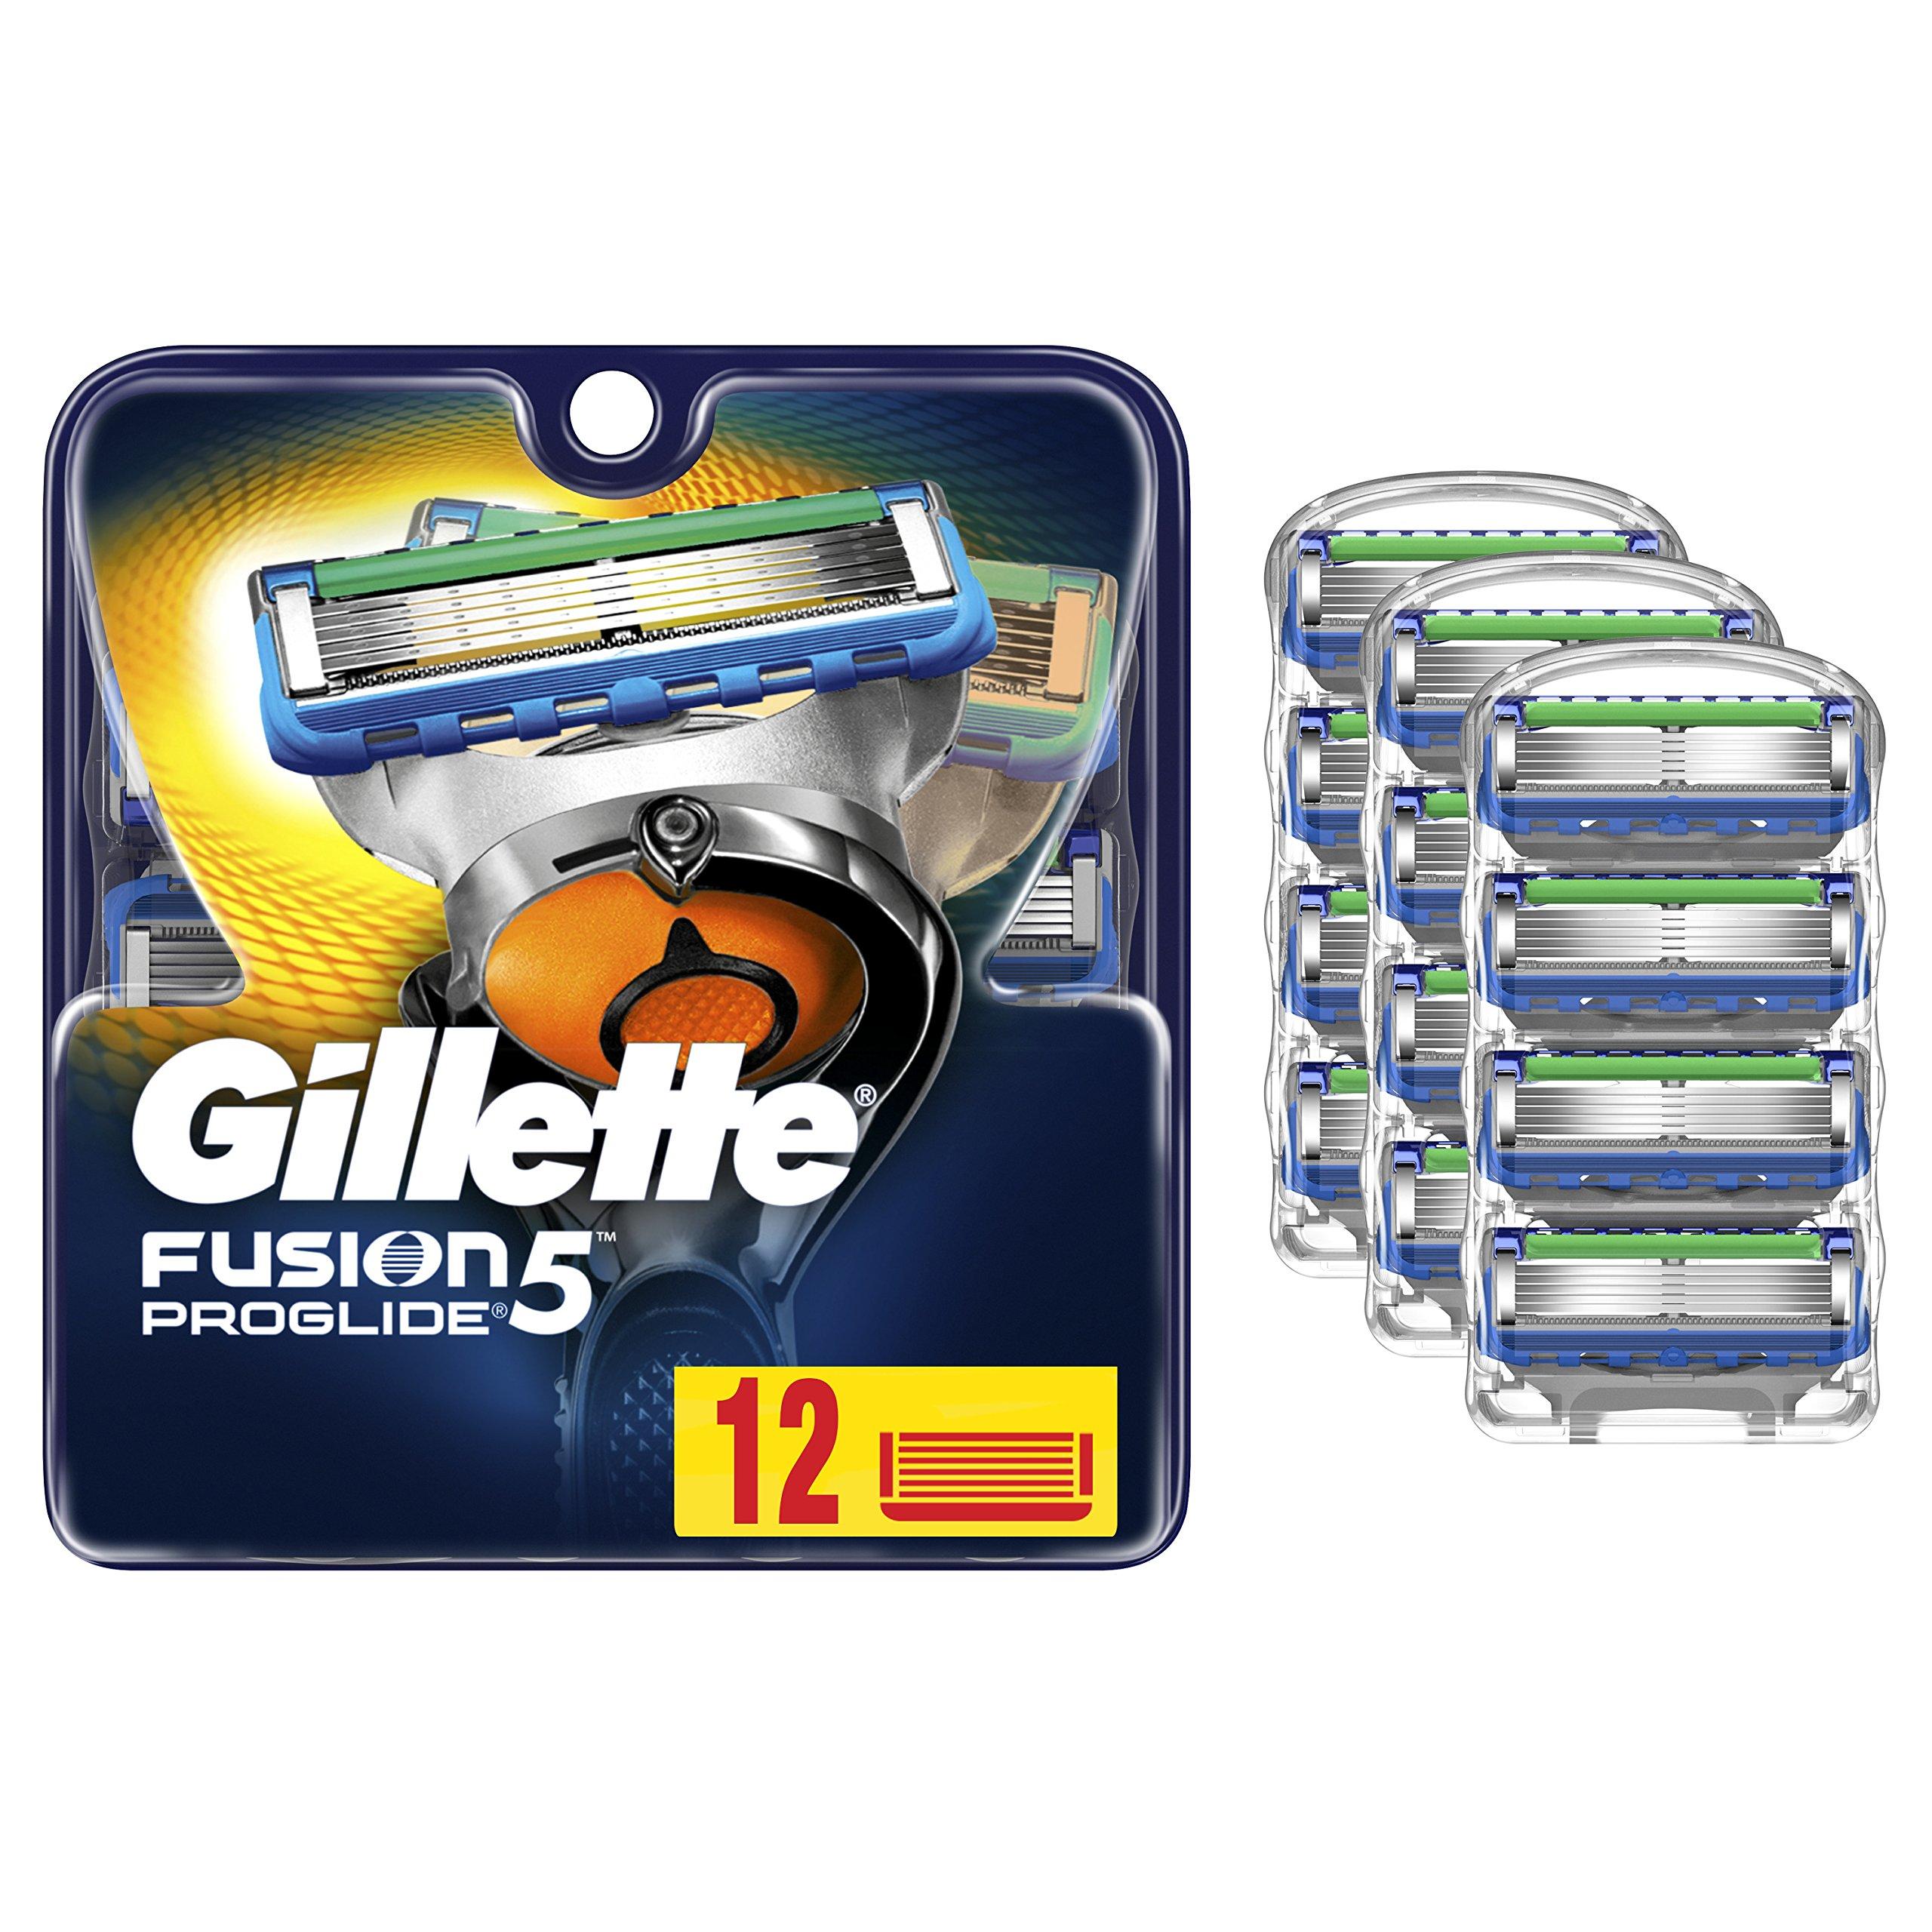 Gillette Fusion5 ProGlide Men's Razor Blades, 12 Blade Refills by Gillette (Image #2)